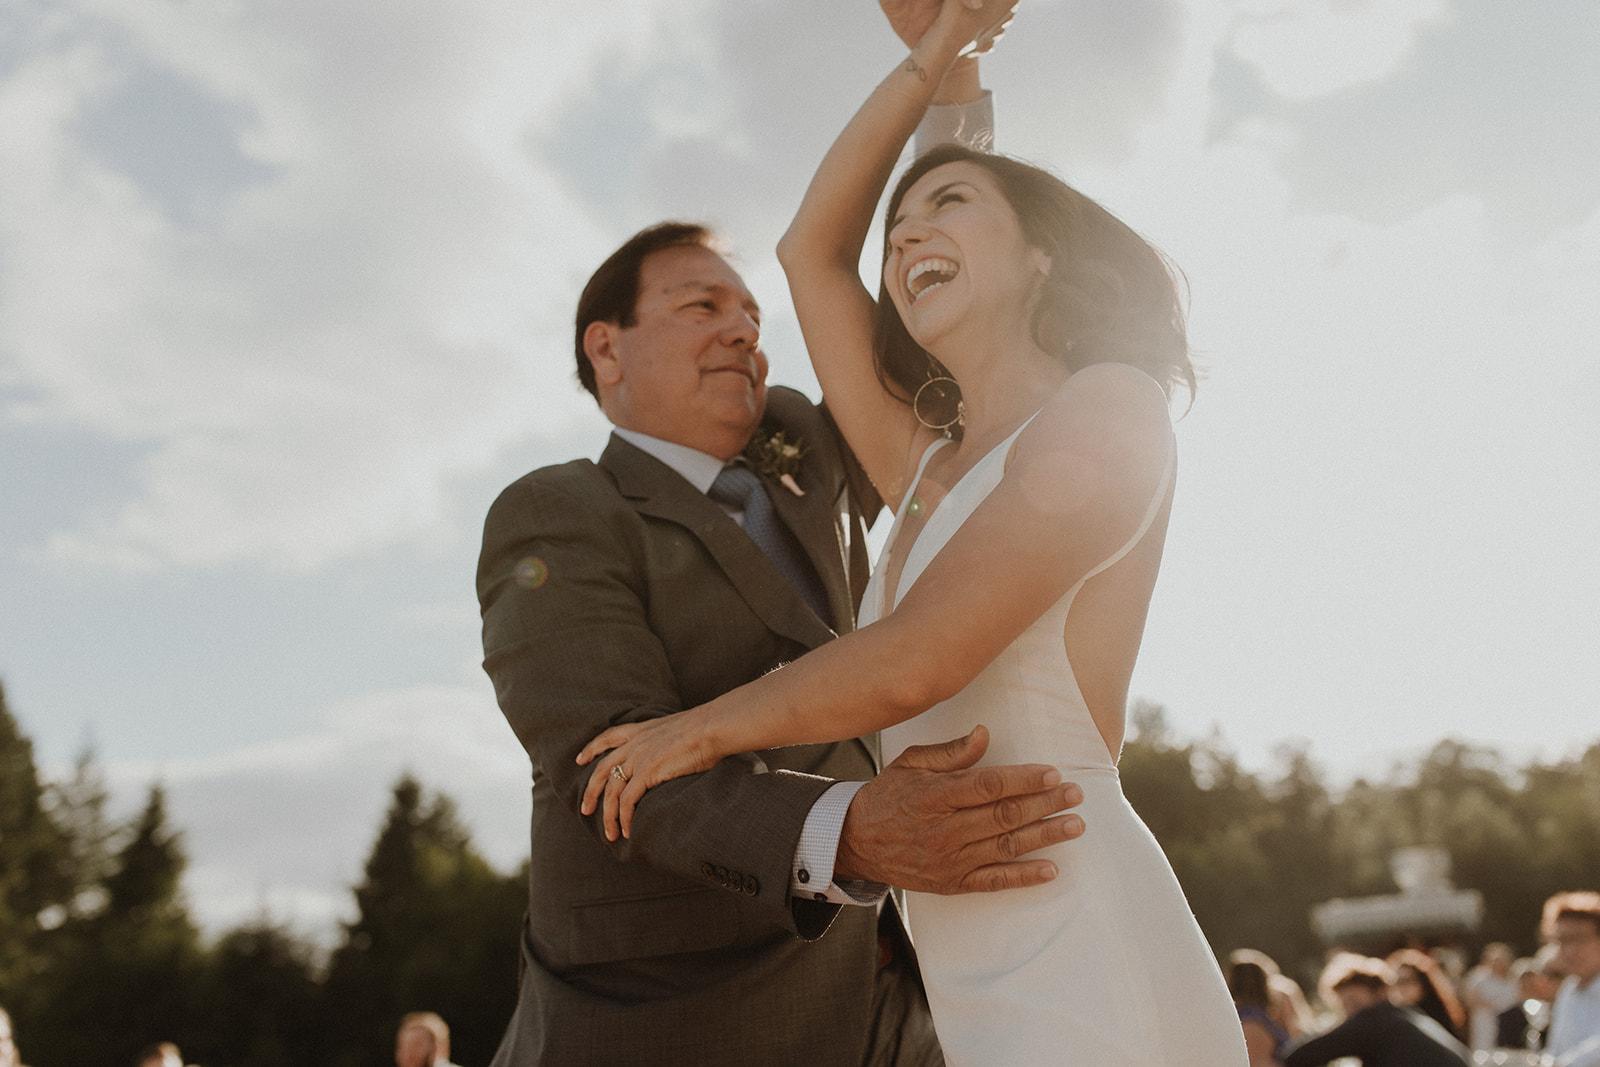 cortney_skye_wedding_june2019-620.jpg